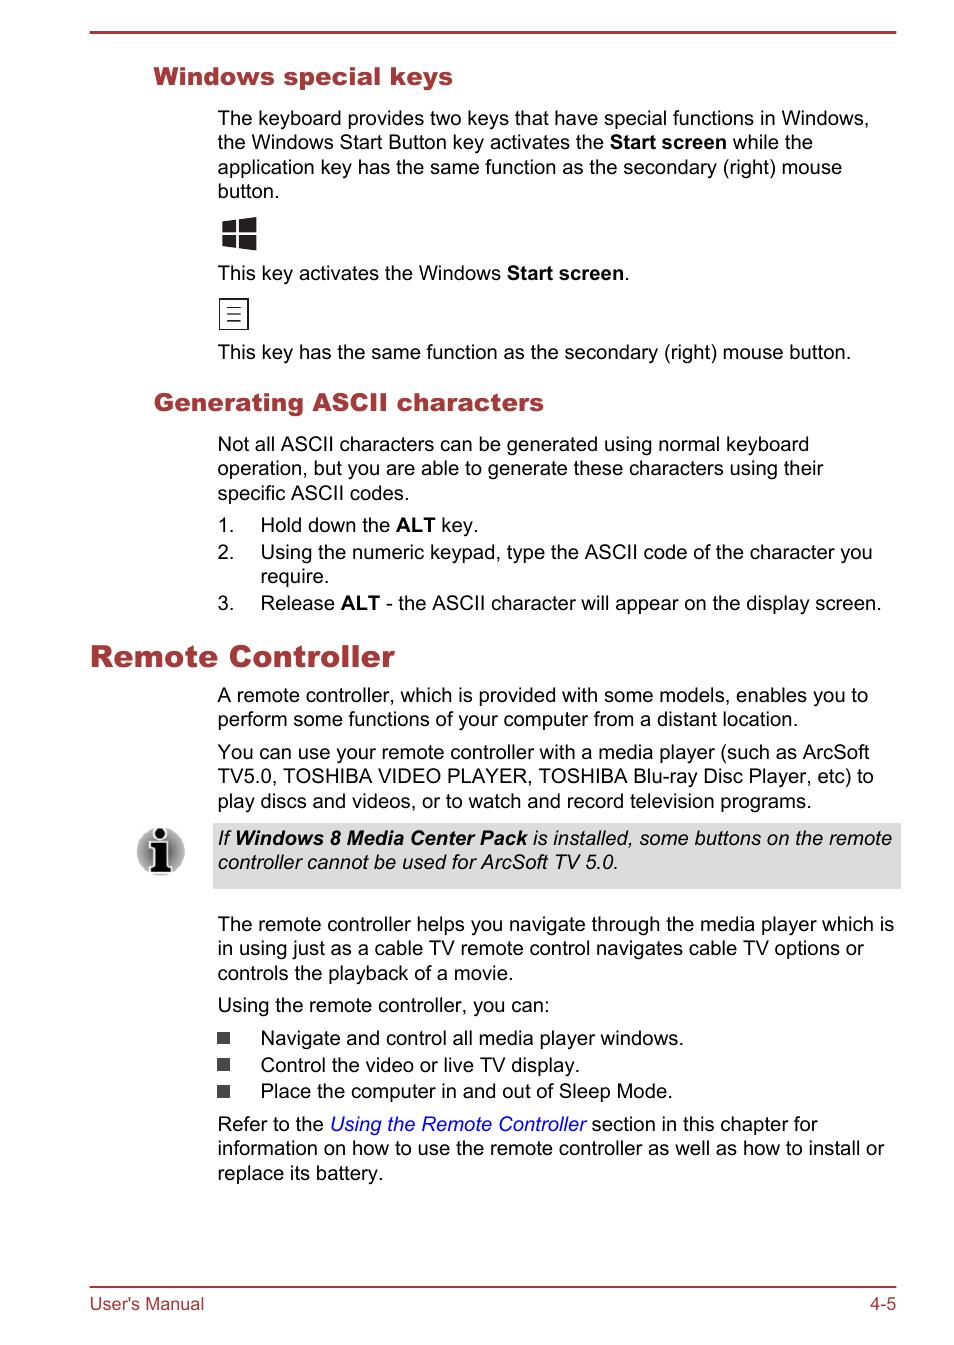 Windows special keys, Generating ascii characters, Remote